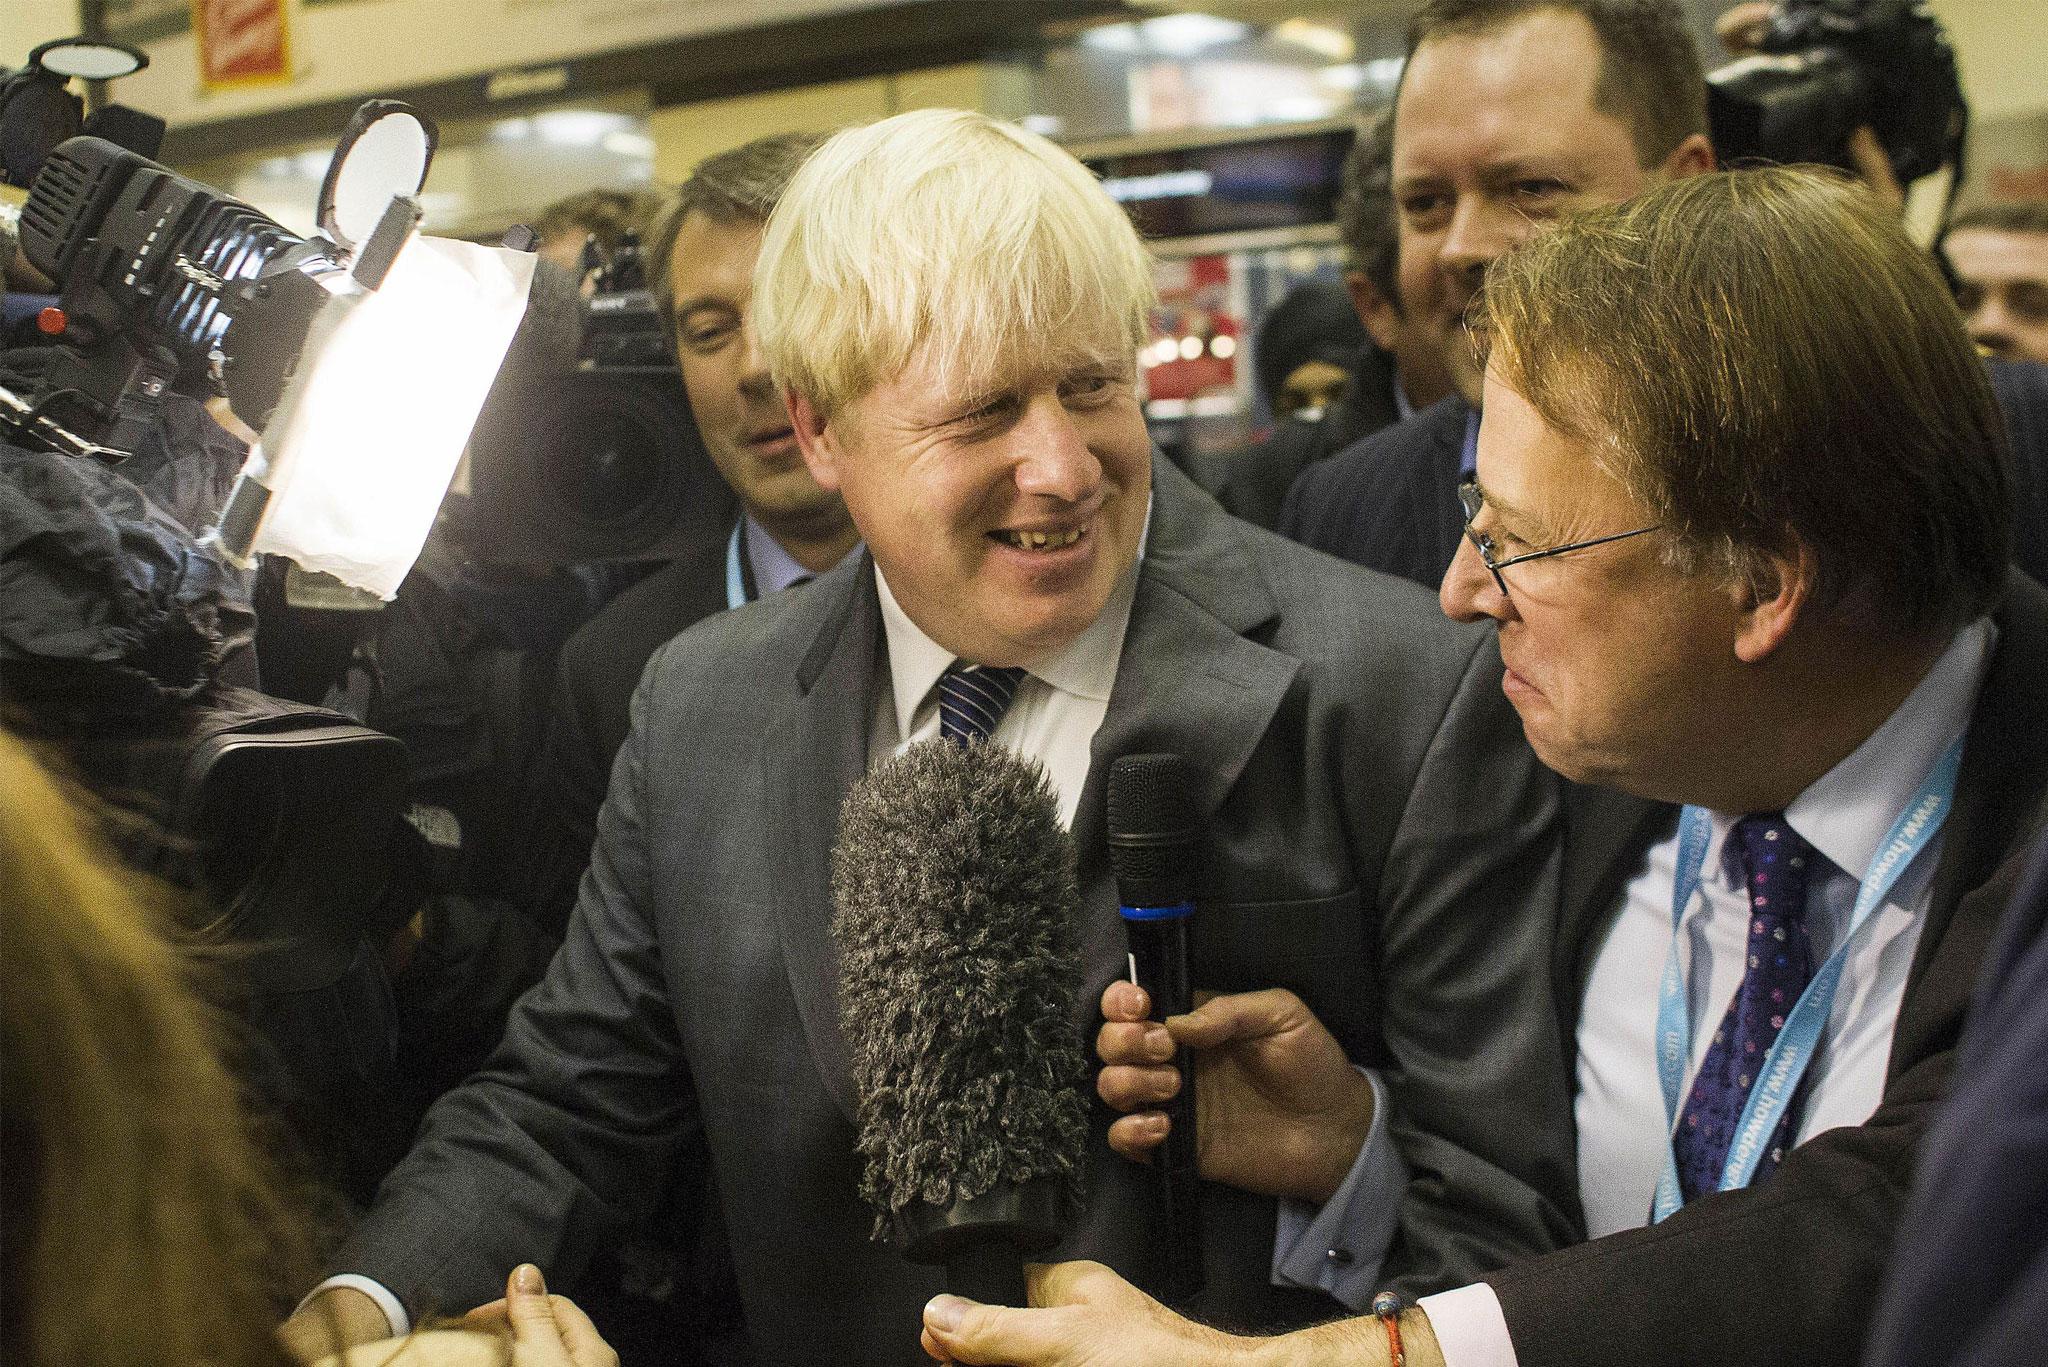 Michael Crick interviews Boris Johnson.